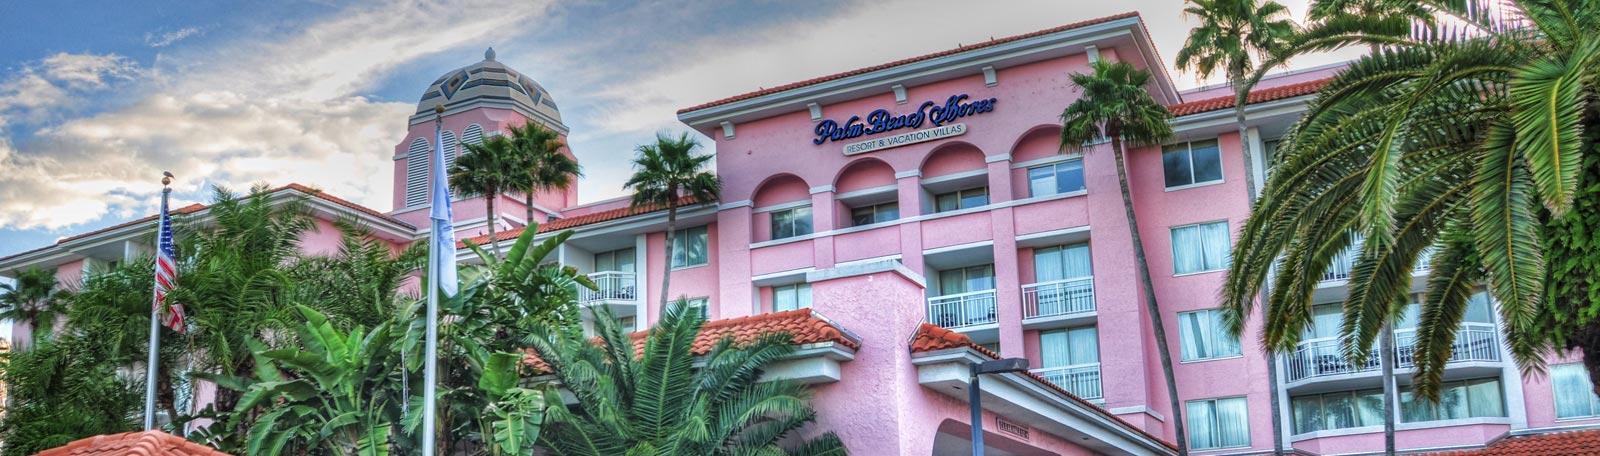 West Palm Beach Fl Marriott Timeshare